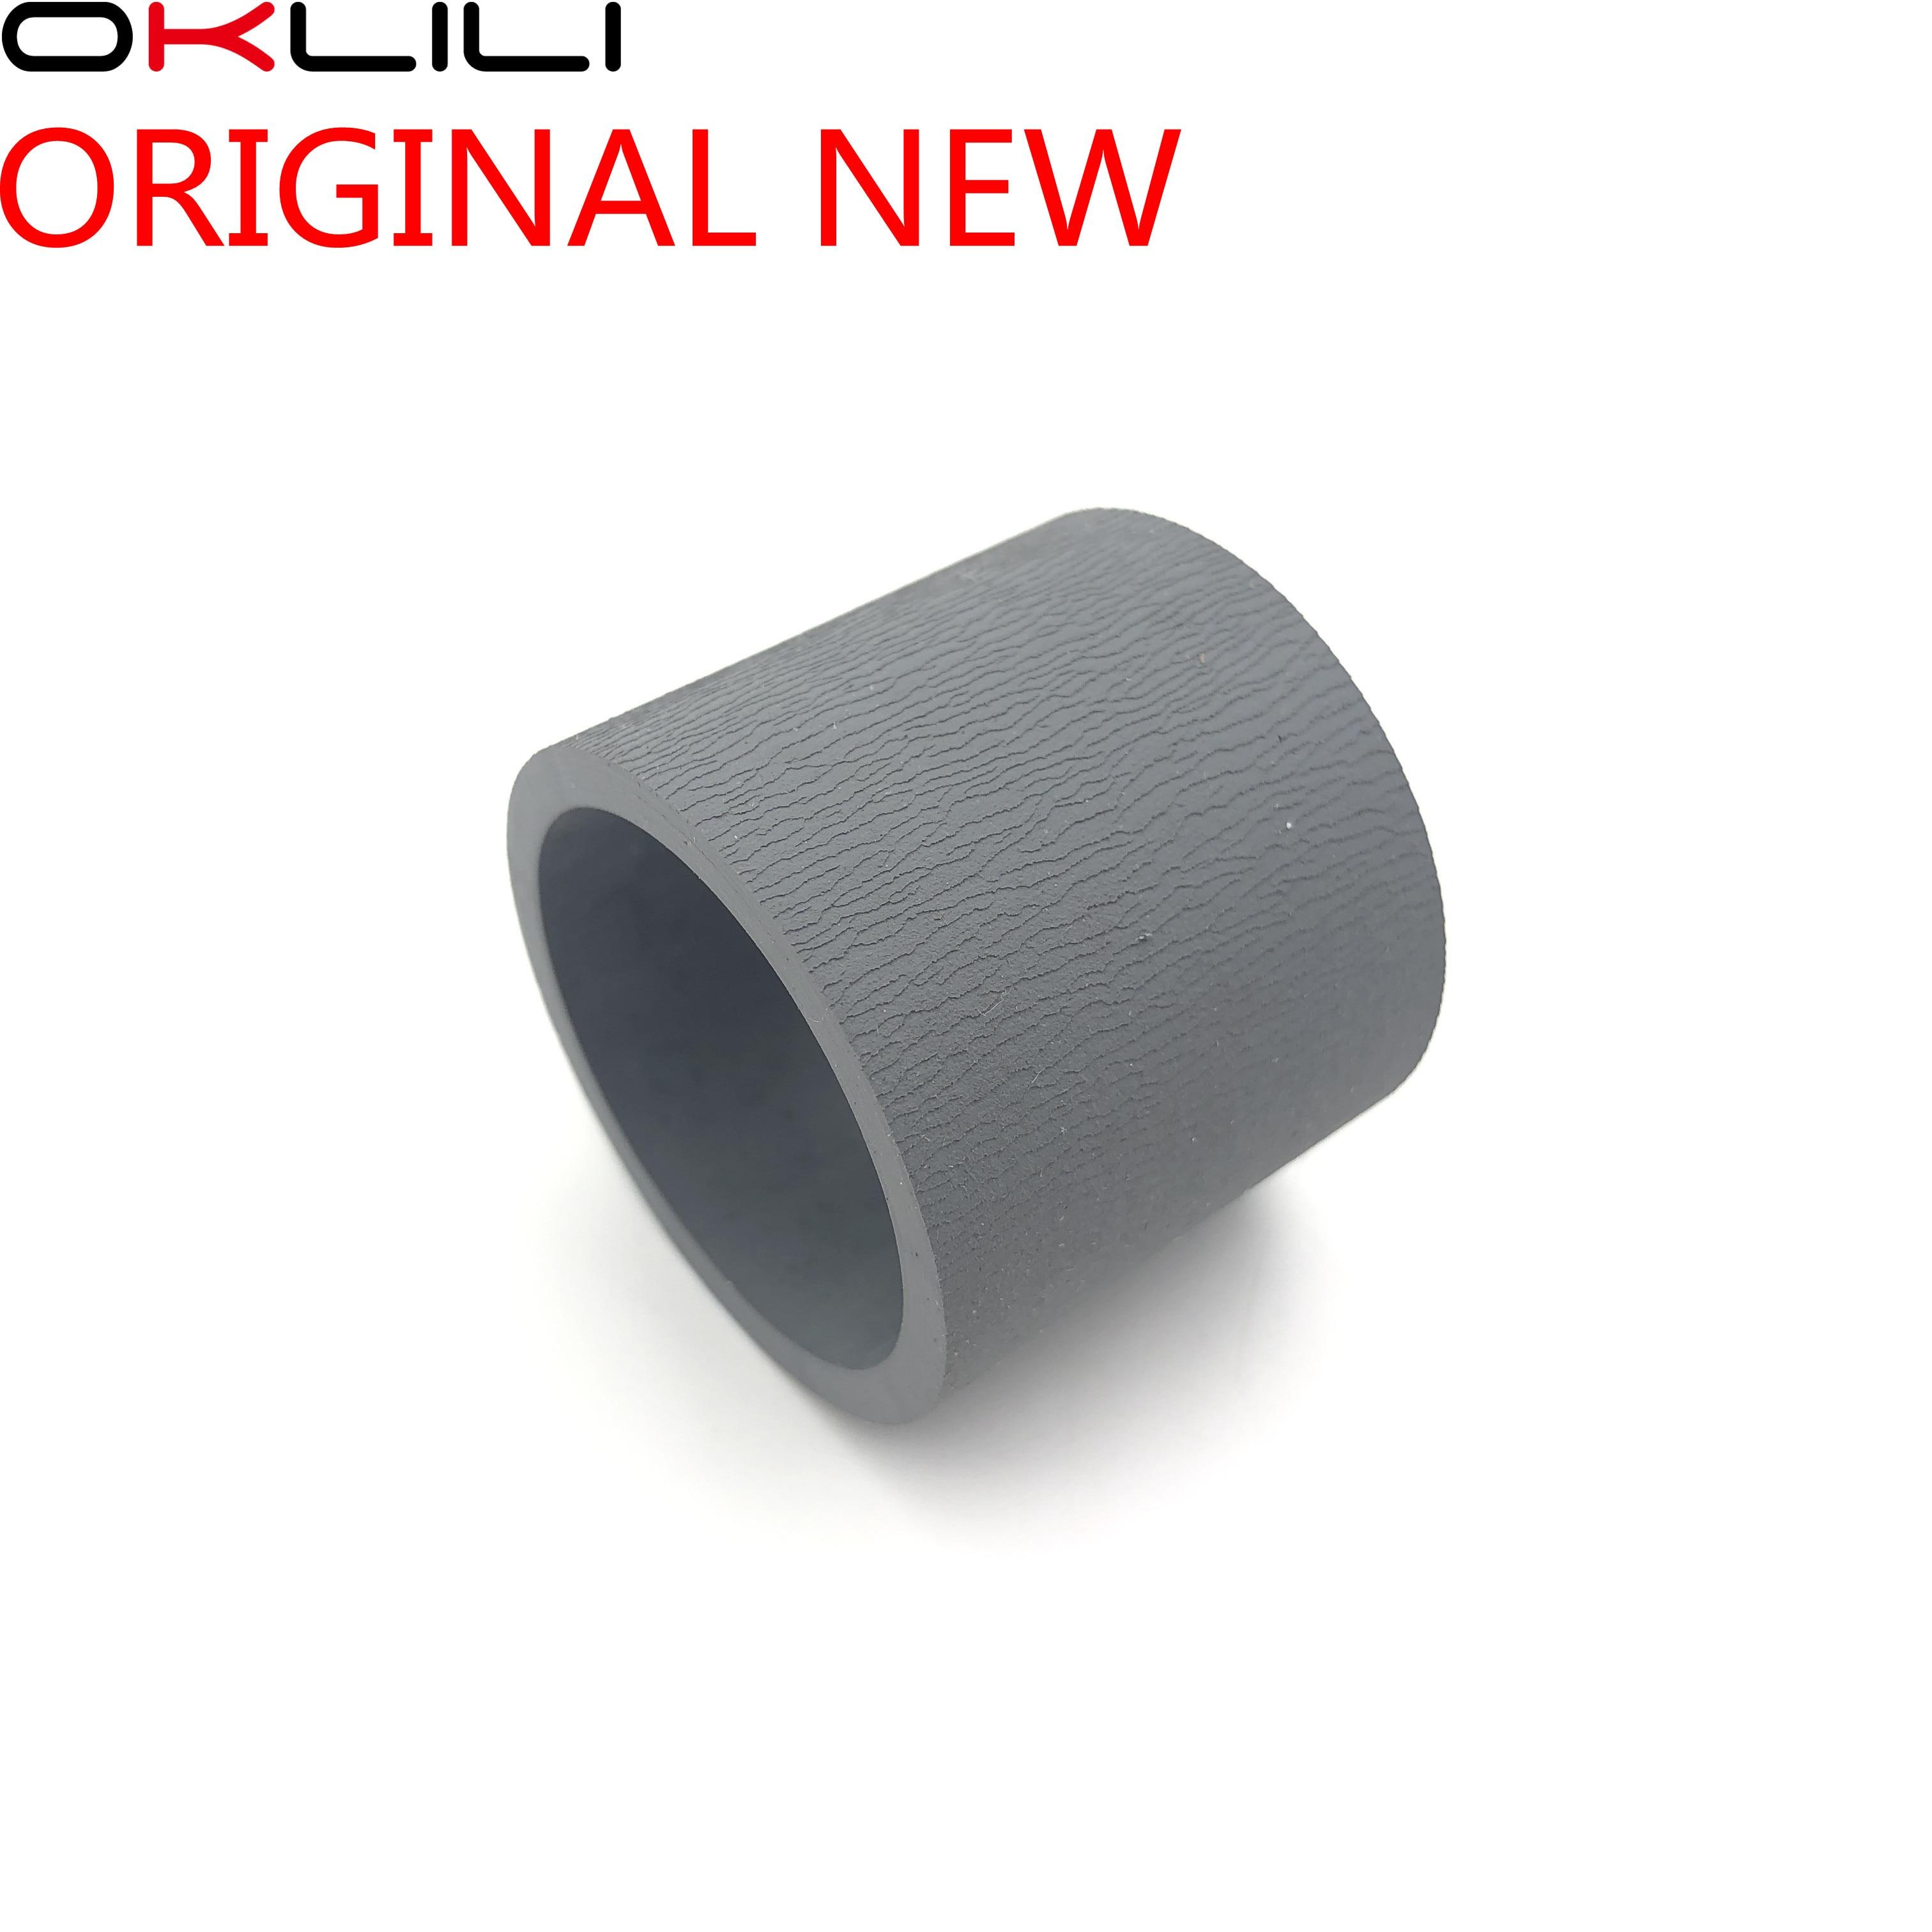 1 X JC73-00265A JC97-03062A Pickup Roller For Samsung ML2850 ML2851 ML2855 SCX4824 SCX4826 SCX4828 For Xerox 3150 3210 3220 3250